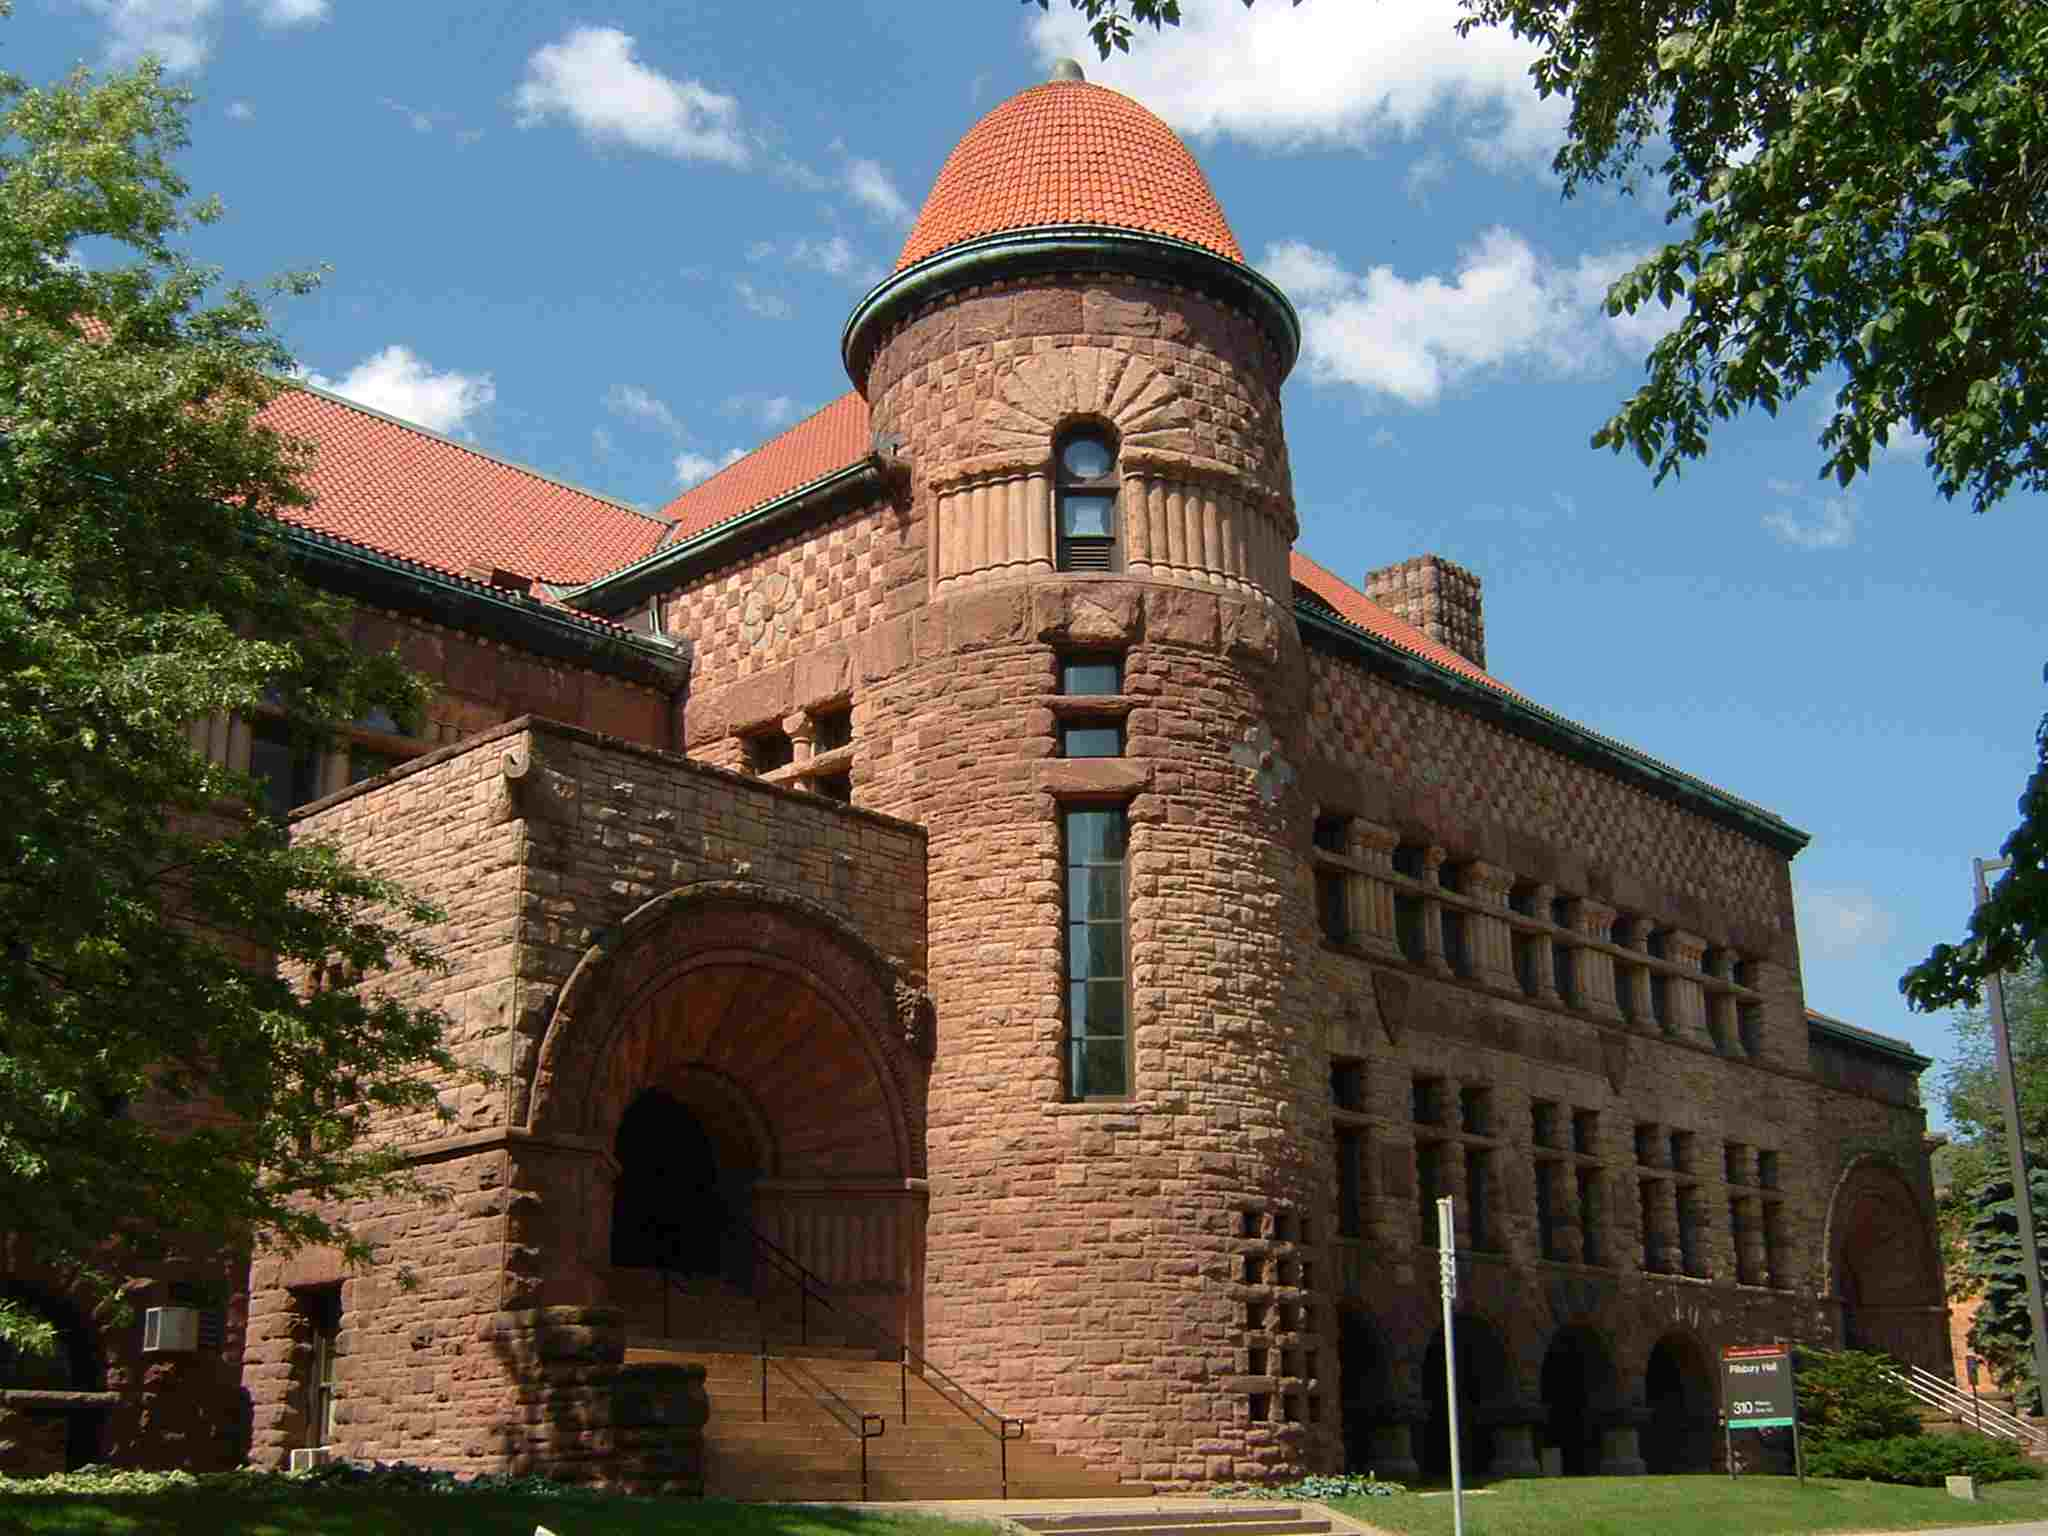 Pillsbury Hall at the University of Minnesota